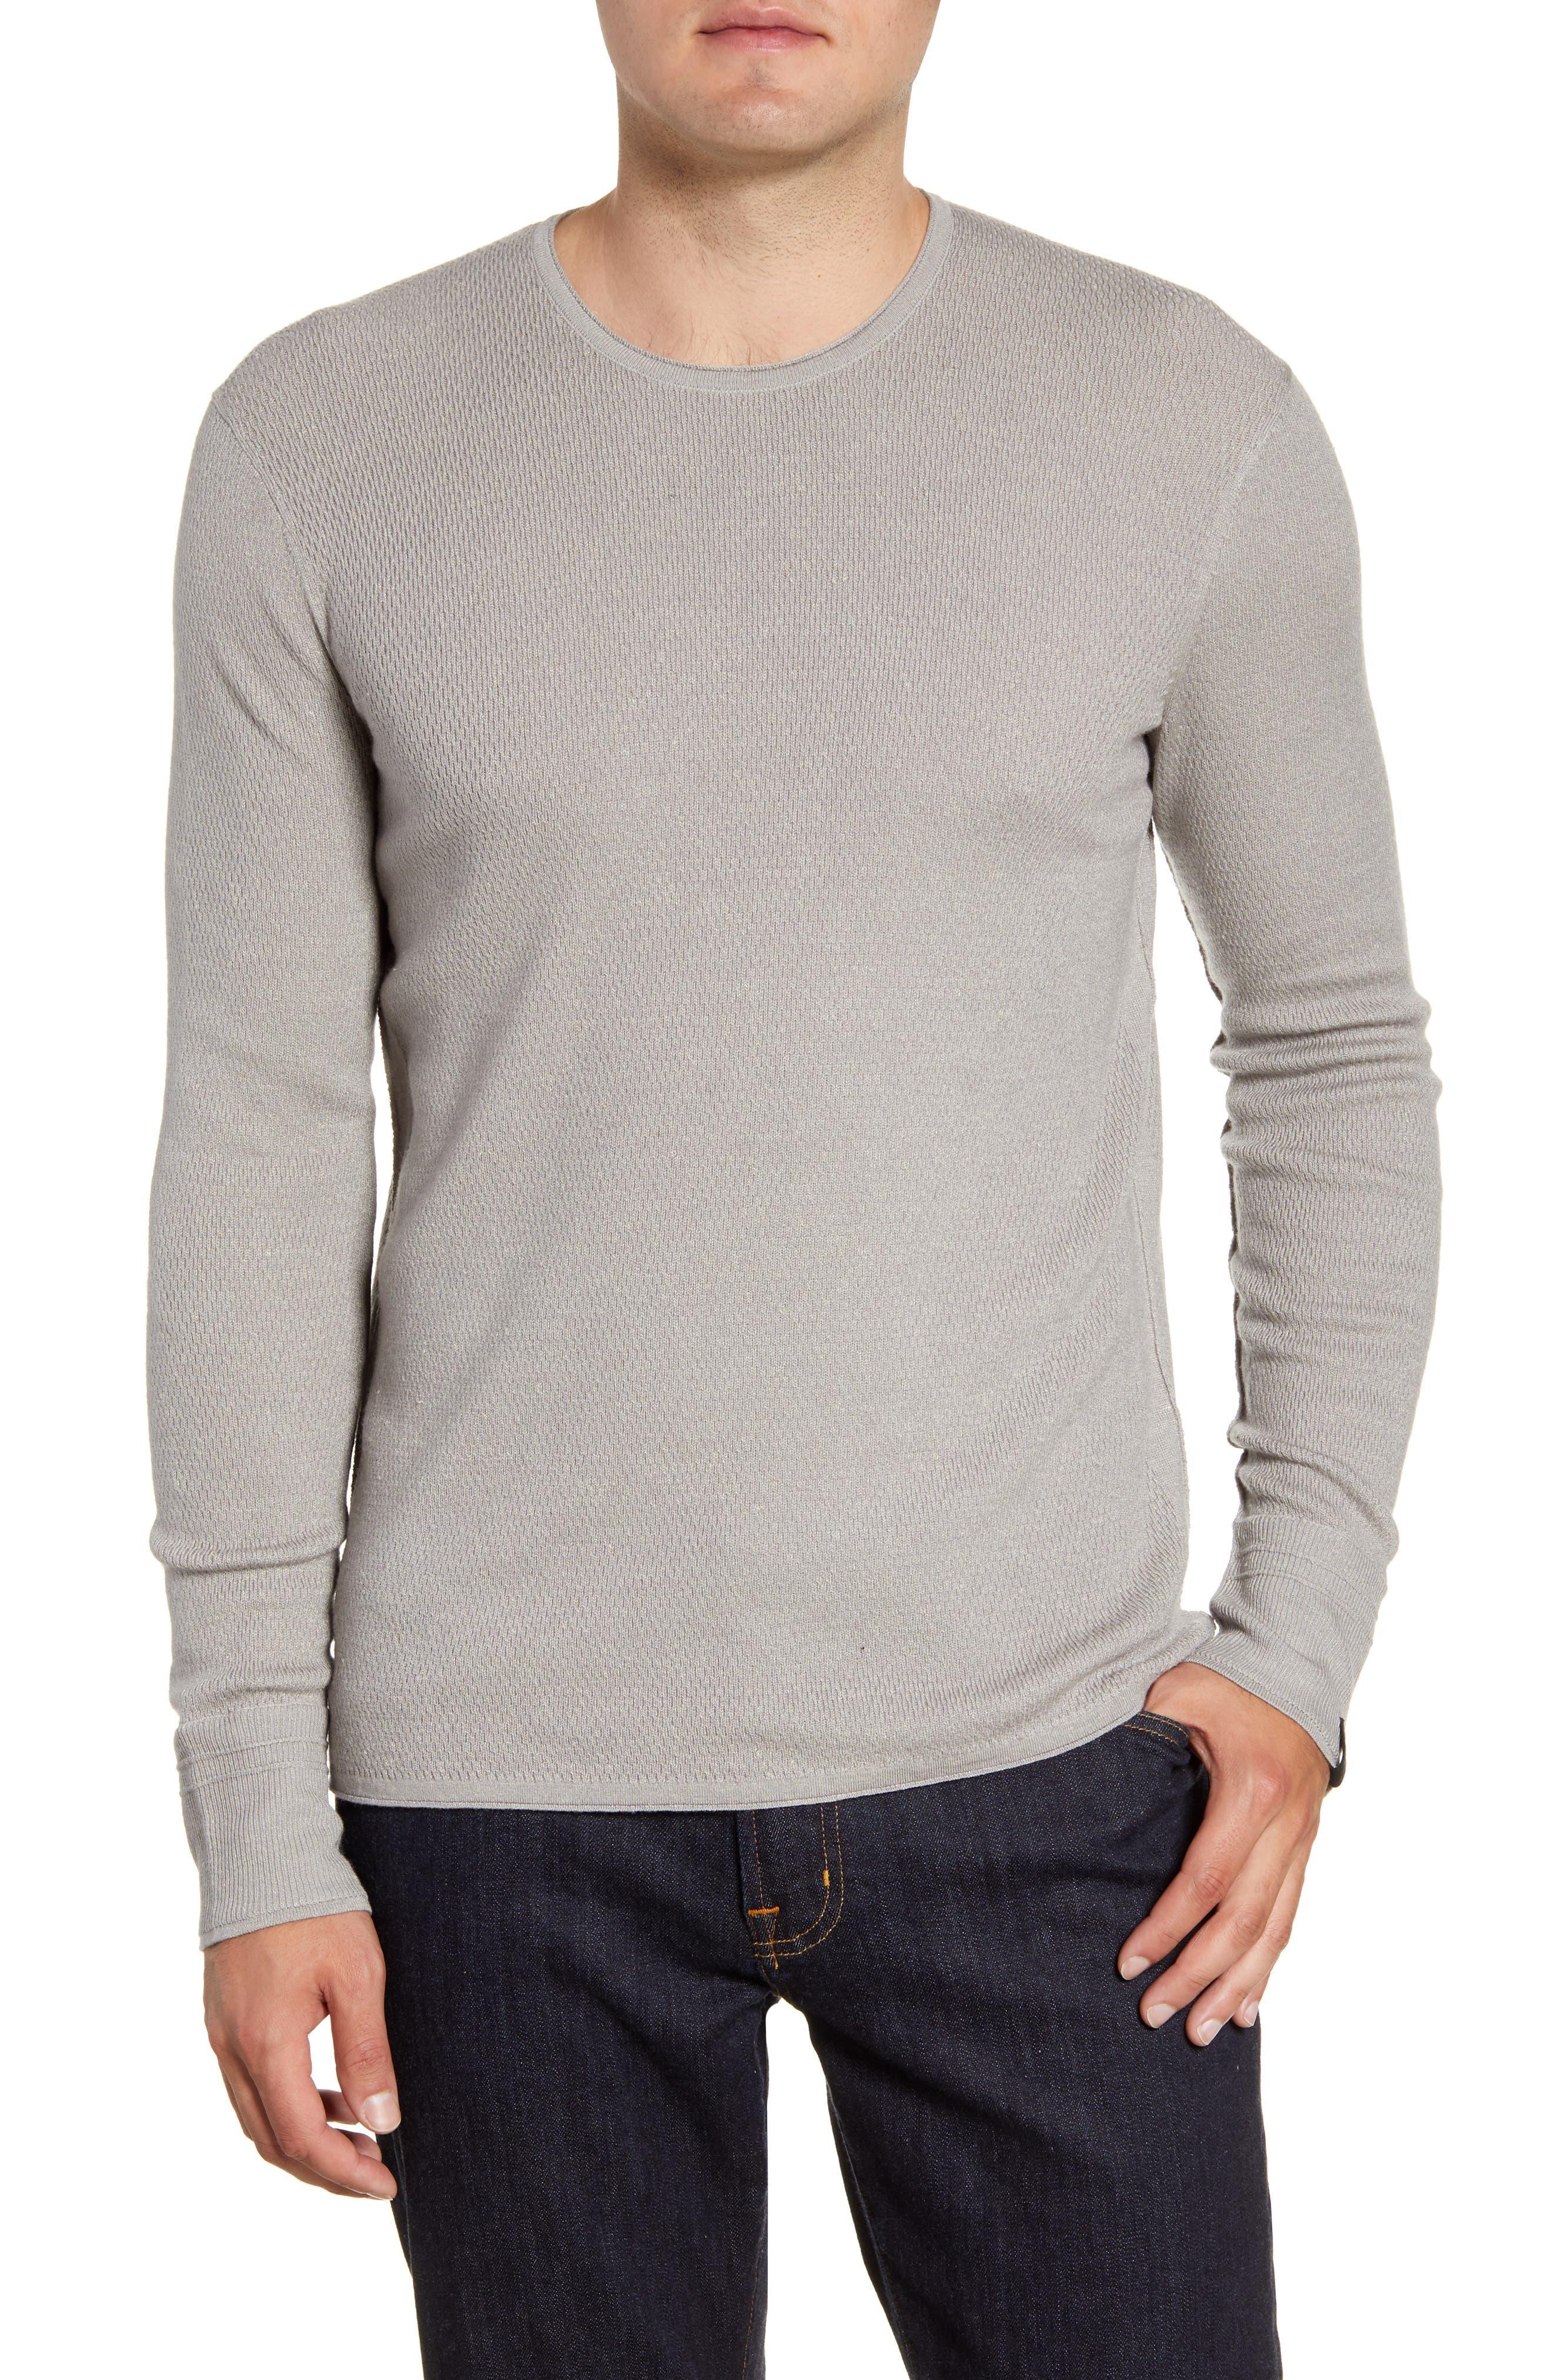 Image of Rag & Bone Davis Slim Fit Crewneck Sweater